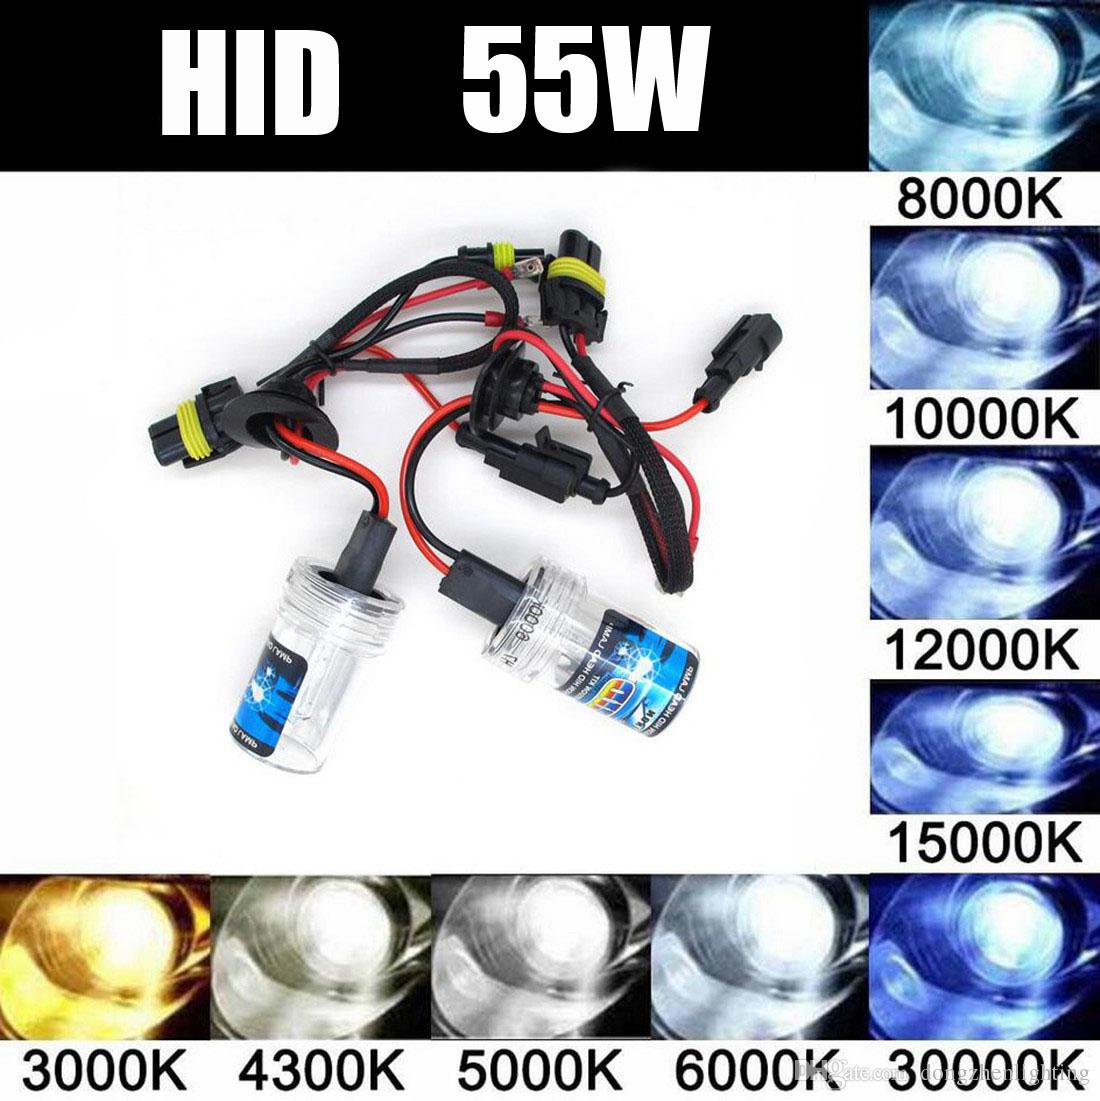 55W HID Headlight Daytime Running Light Xenon Bulbs Fog Lamp H1 H3 H7 H11 H8 H9 H27 9005 9006 880 881 D2R D2S HB1 HB3 HB4 HB5 H4 5202 H16 Led Car